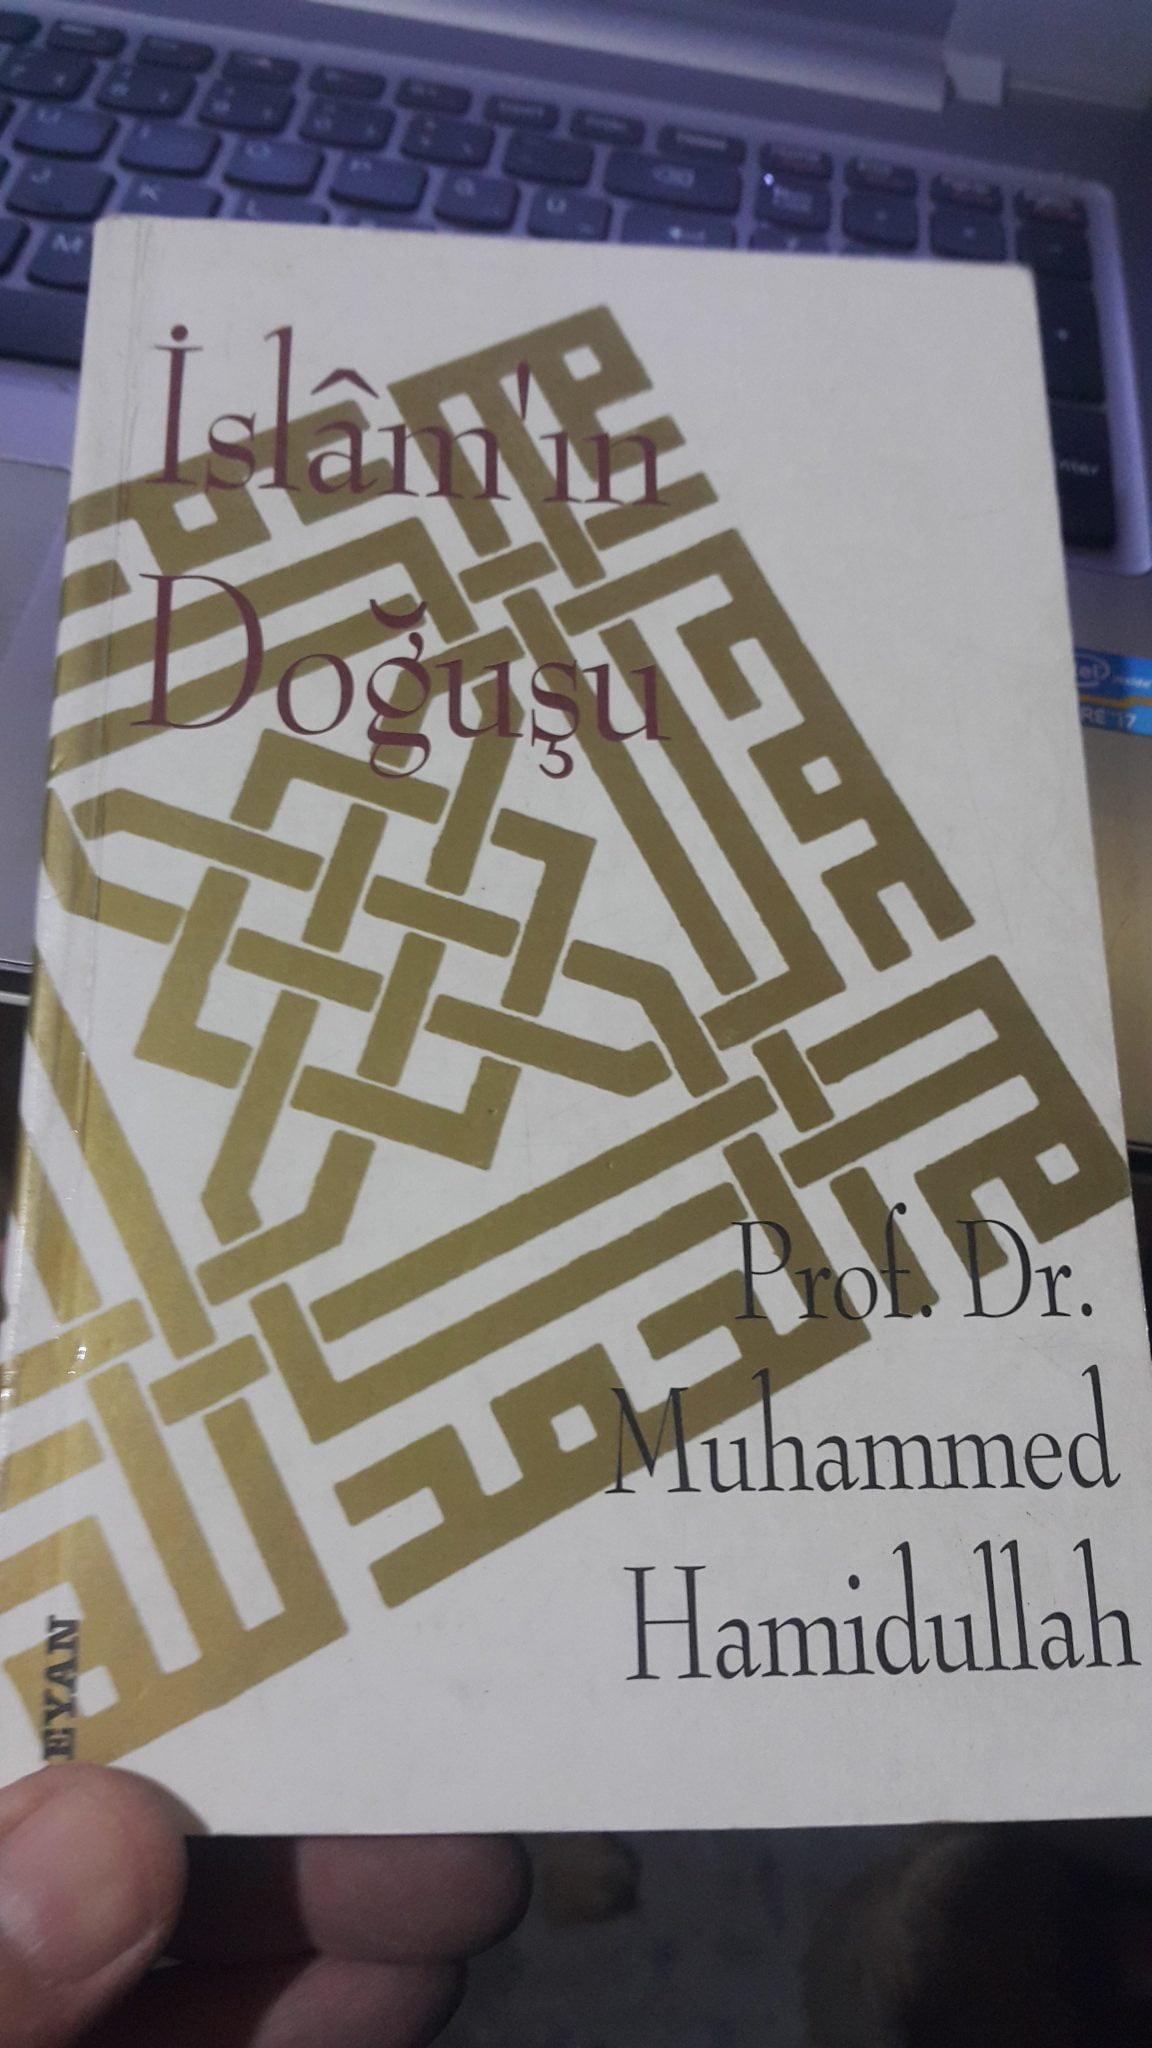 İSLAM'IN DOĞUŞU/Muhammed Hamidullah